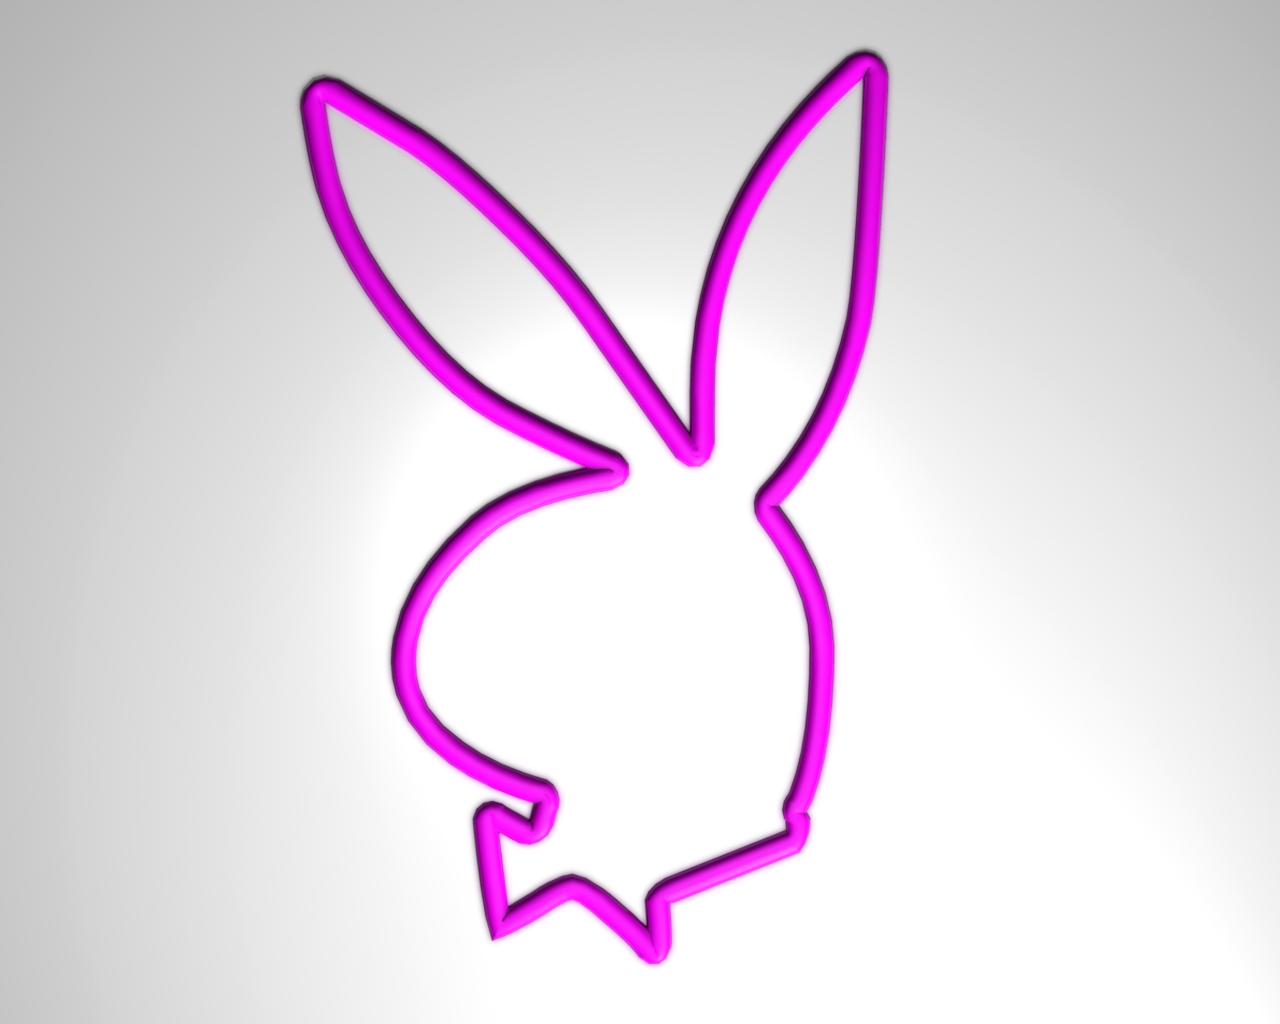 The sketchpad playboy bunny silly bandz